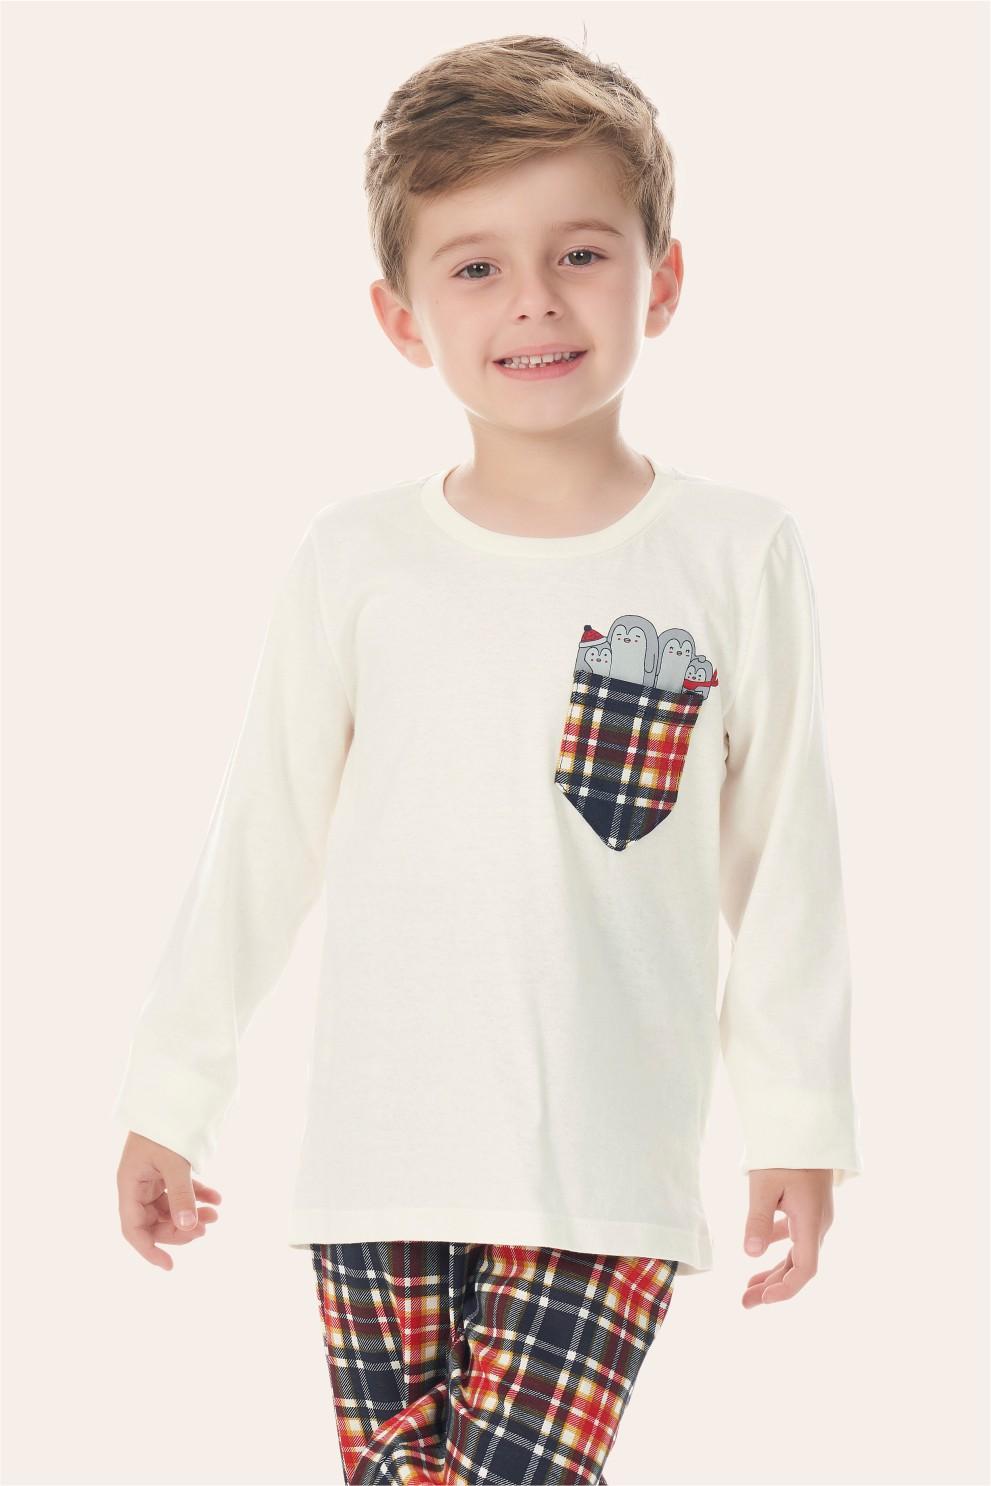 002/N - Pijama Infantil Masculino Happy Family